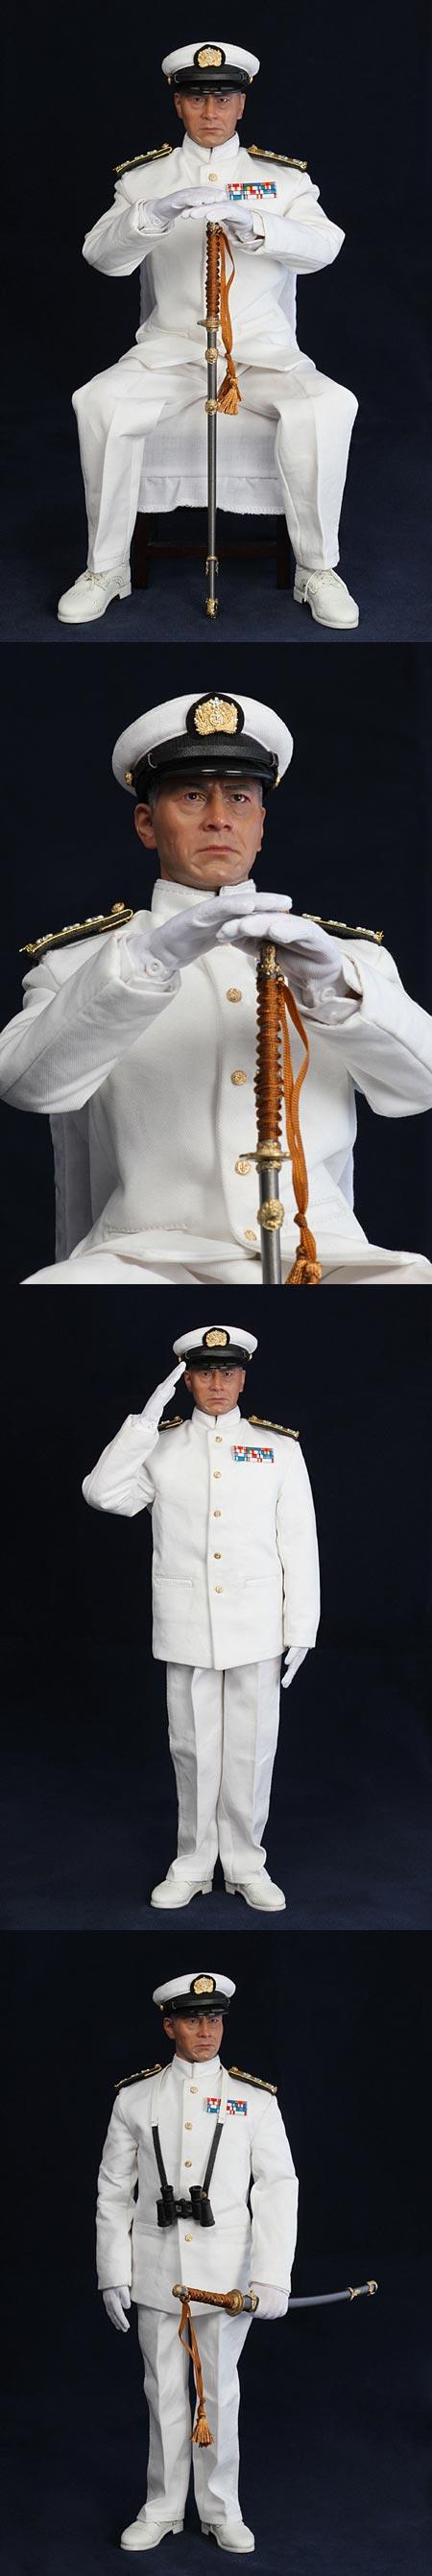 【3R】JP611 三船敏郎 連合艦隊司令長官ver.夏服タイプ  関連商品  3R×FEWTU